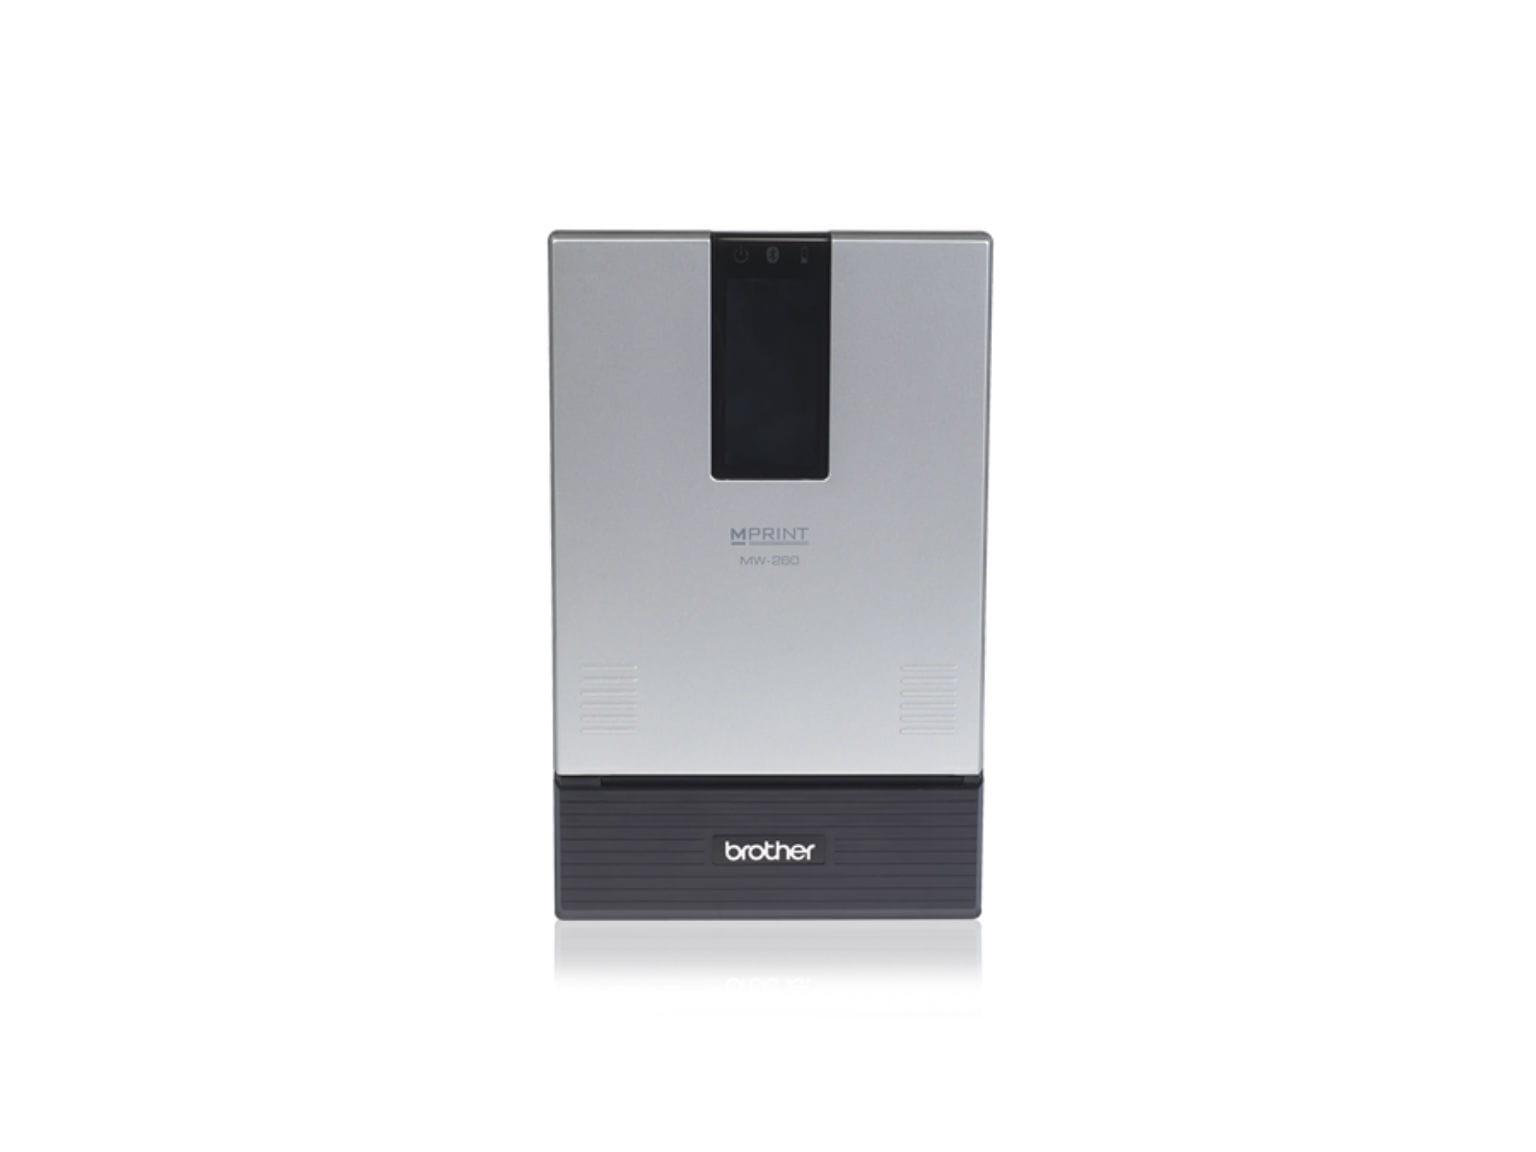 Impresora portátil MW-260